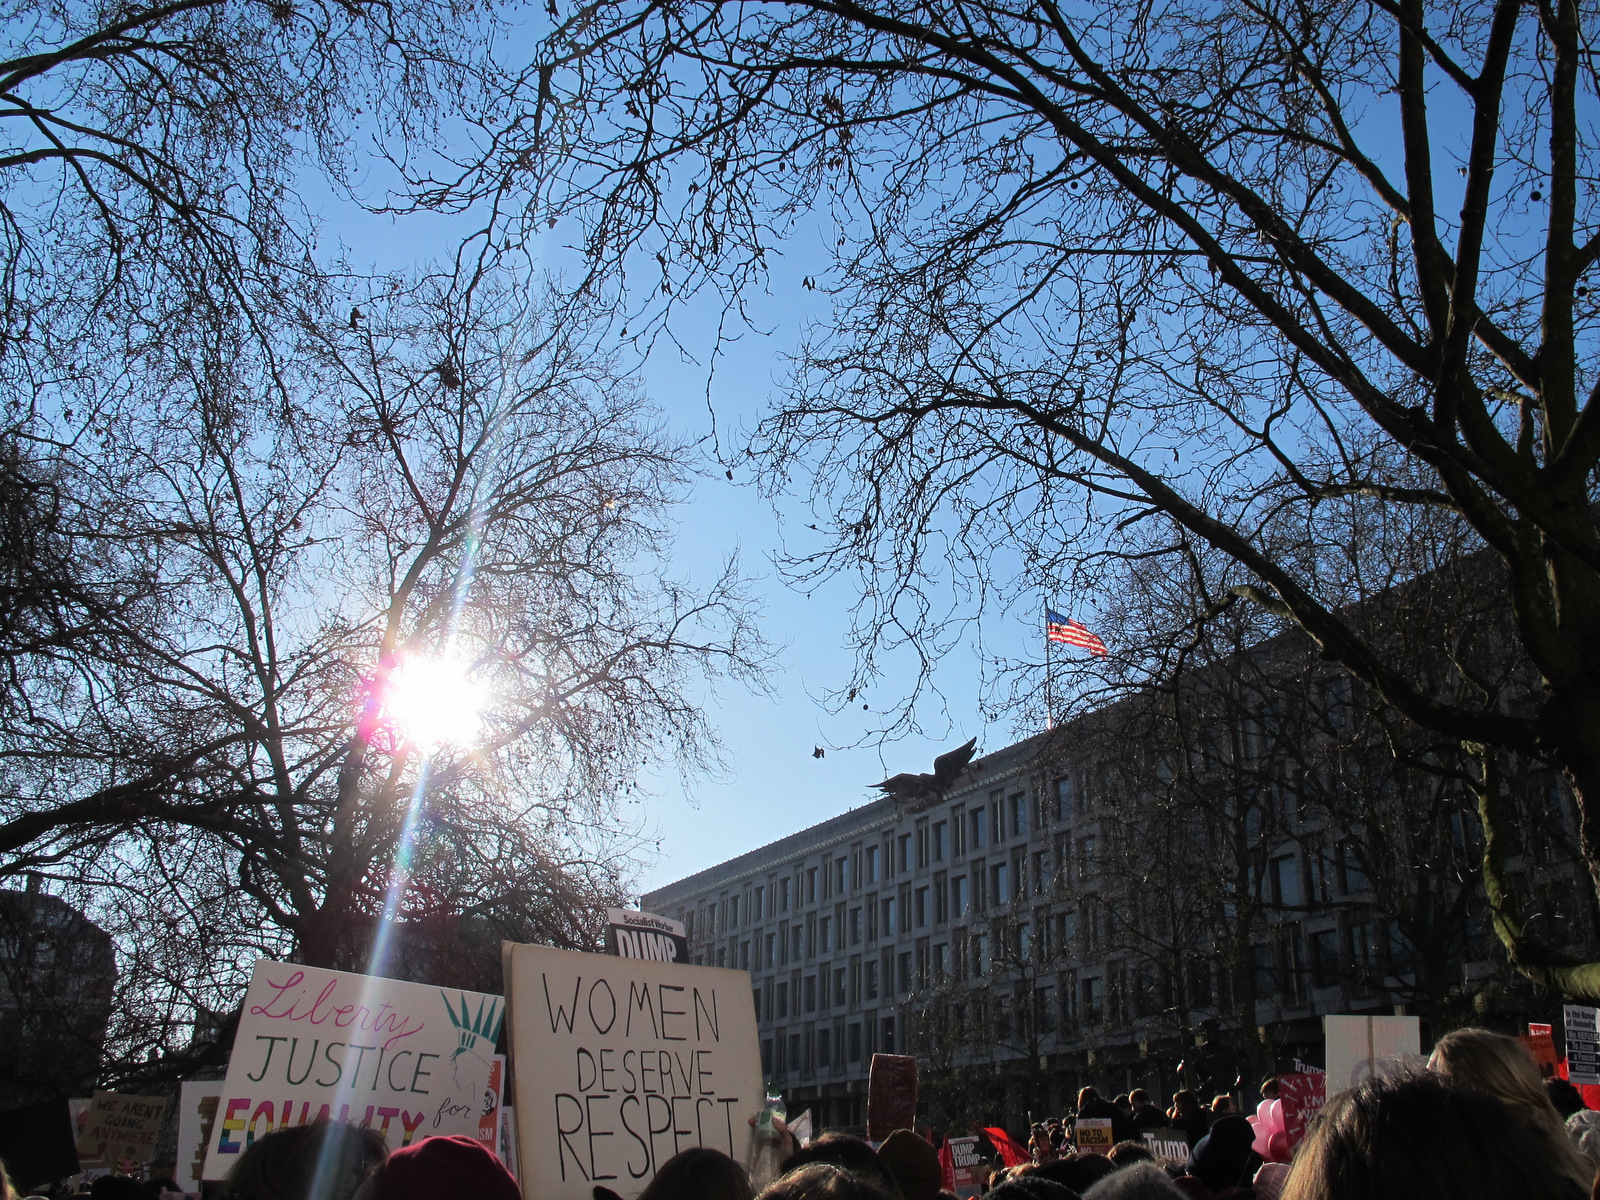 President Trump Womens March 2017 Adventures of a London Kiwi